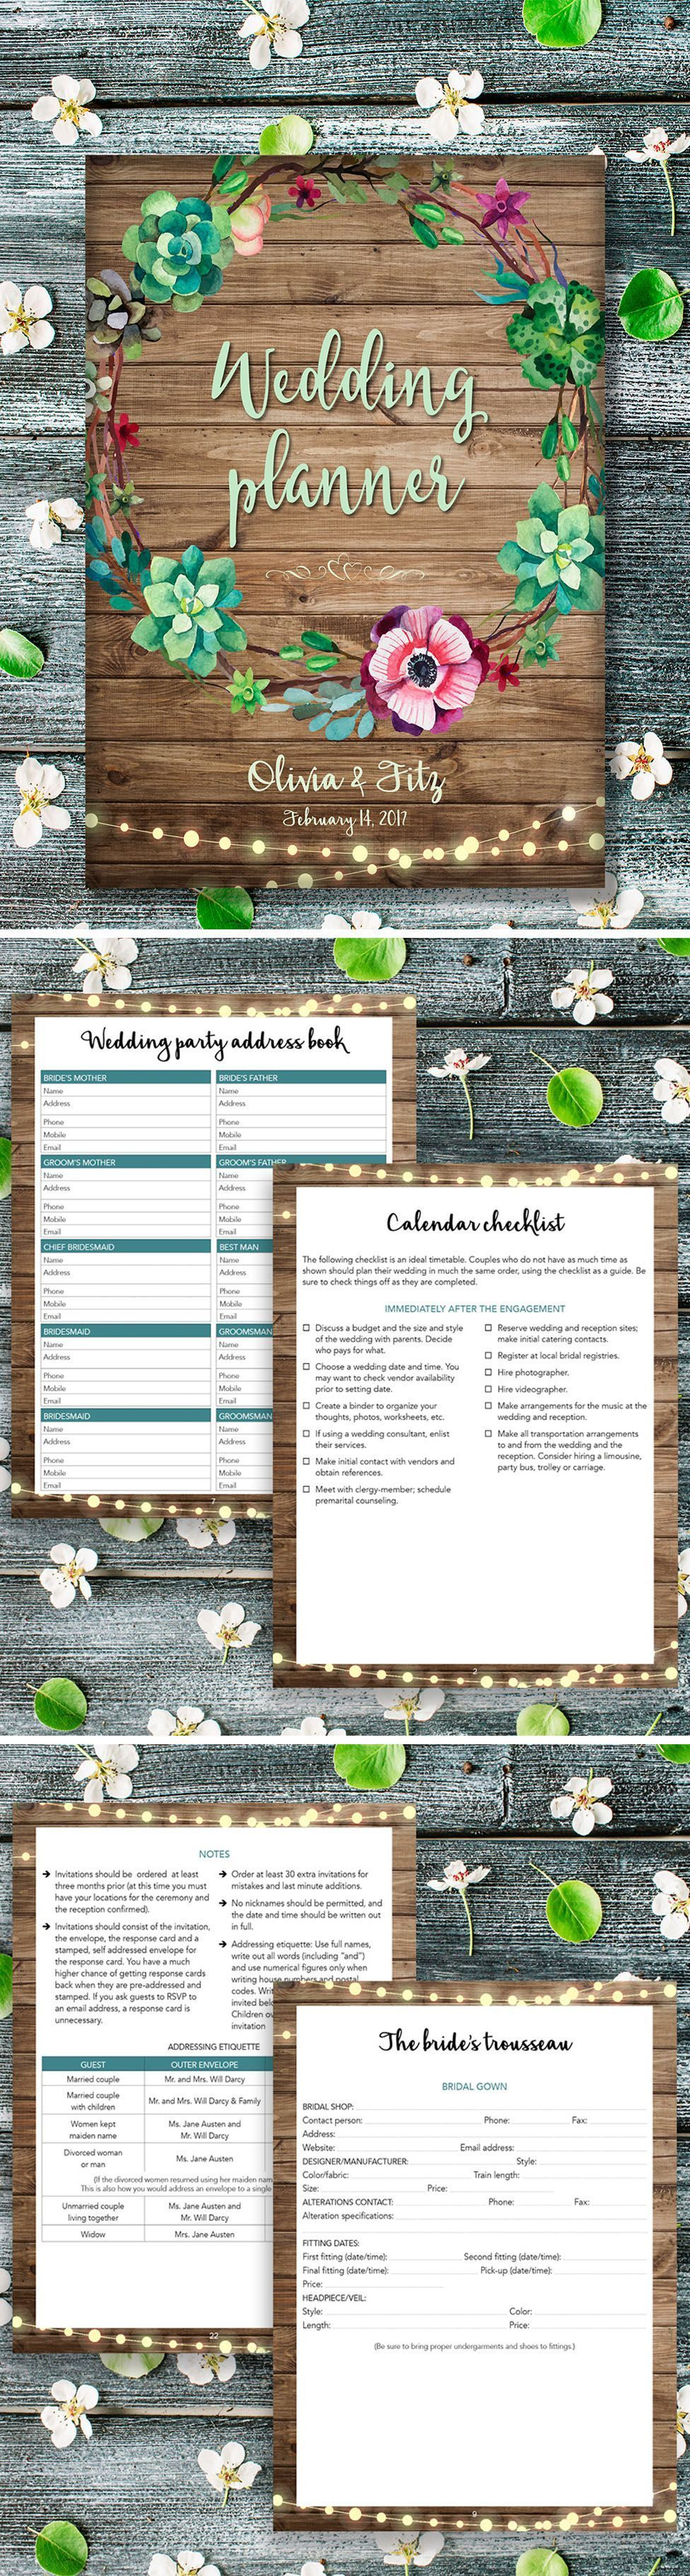 Printable wedding planner, Wedding planner book, DIY wedding guide, PDF wedding kit, Wedding bin ...